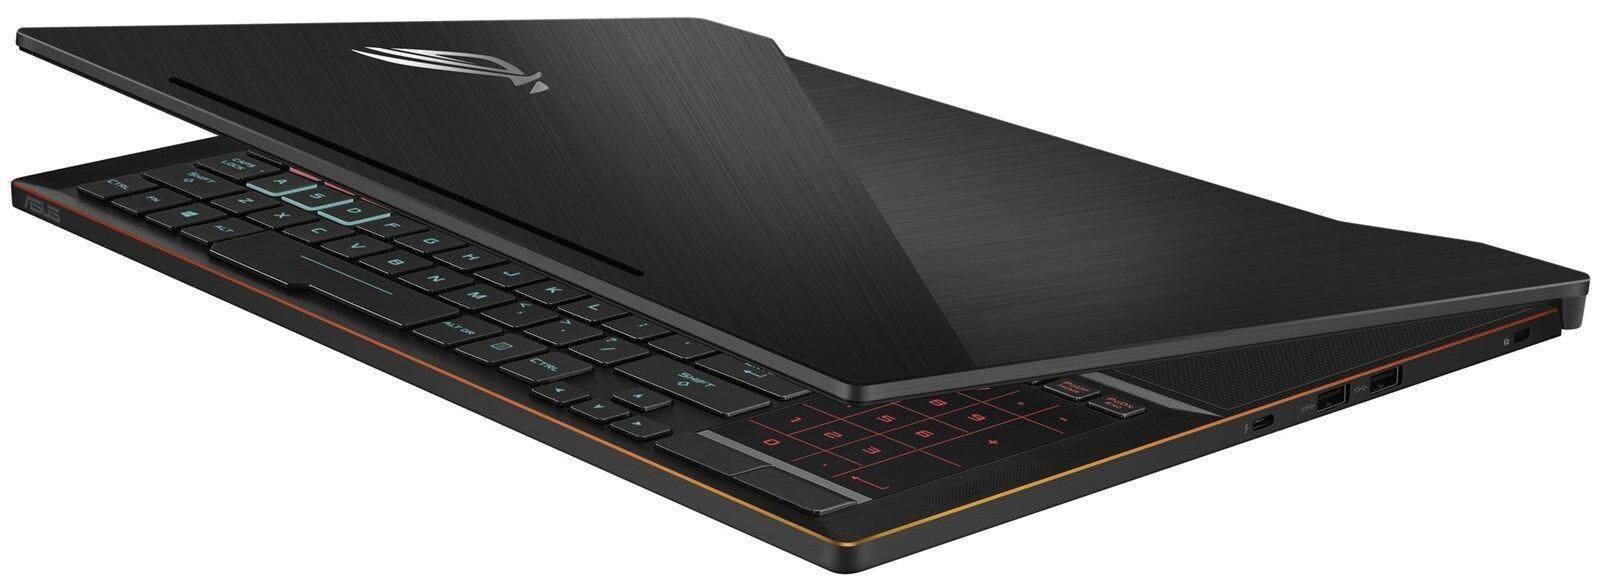 ASUS ROG Zephyrus GX501GI-XS74 Core i7-8750H GTX 1080 8GB (Max-Q) Gaming Laptop Malaysia